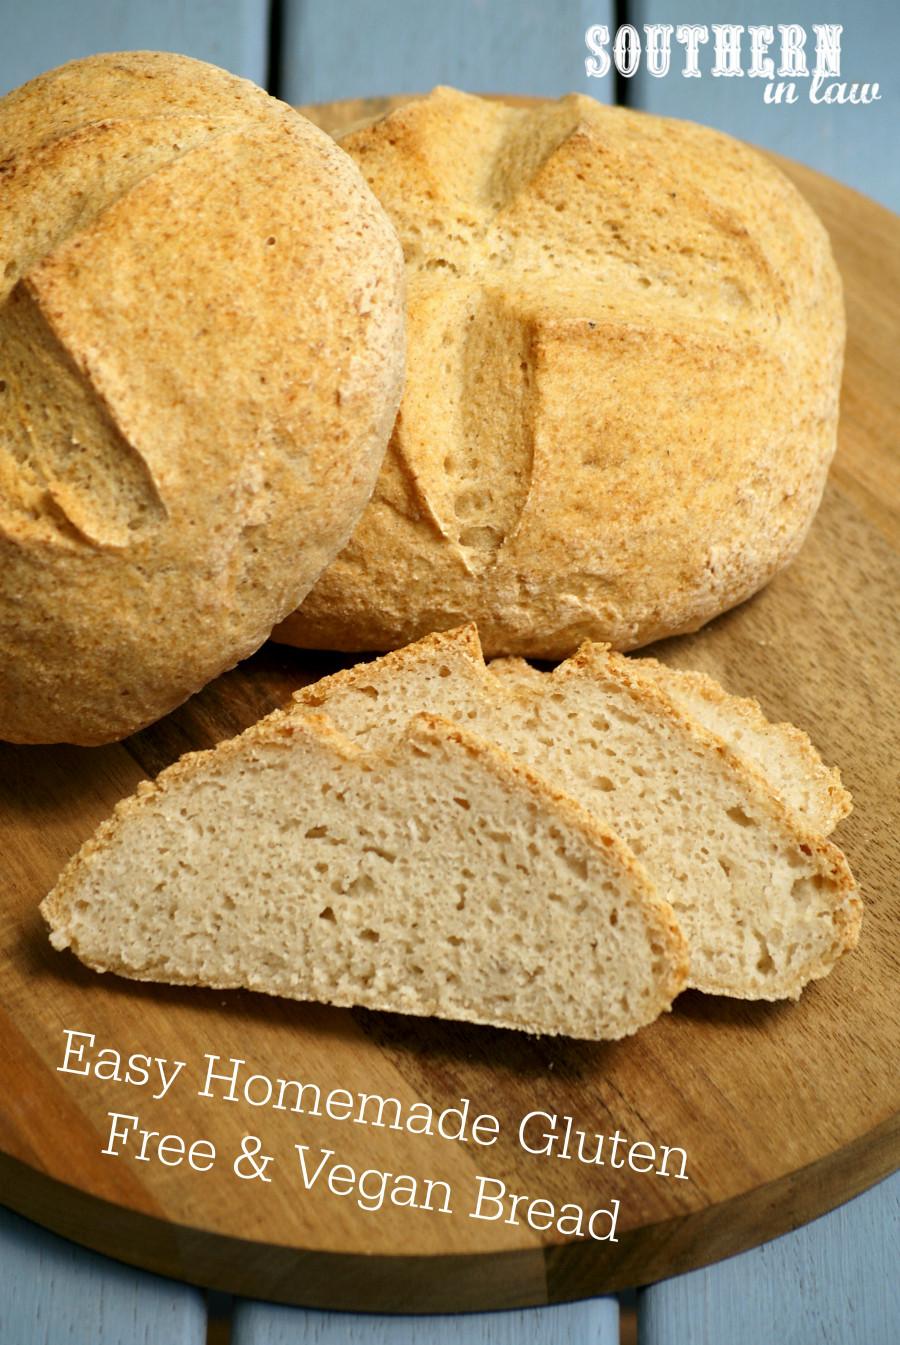 Gluten Free Vegan Bread Recipe  Southern In Law Recipe Easy Homemade Gluten Free and